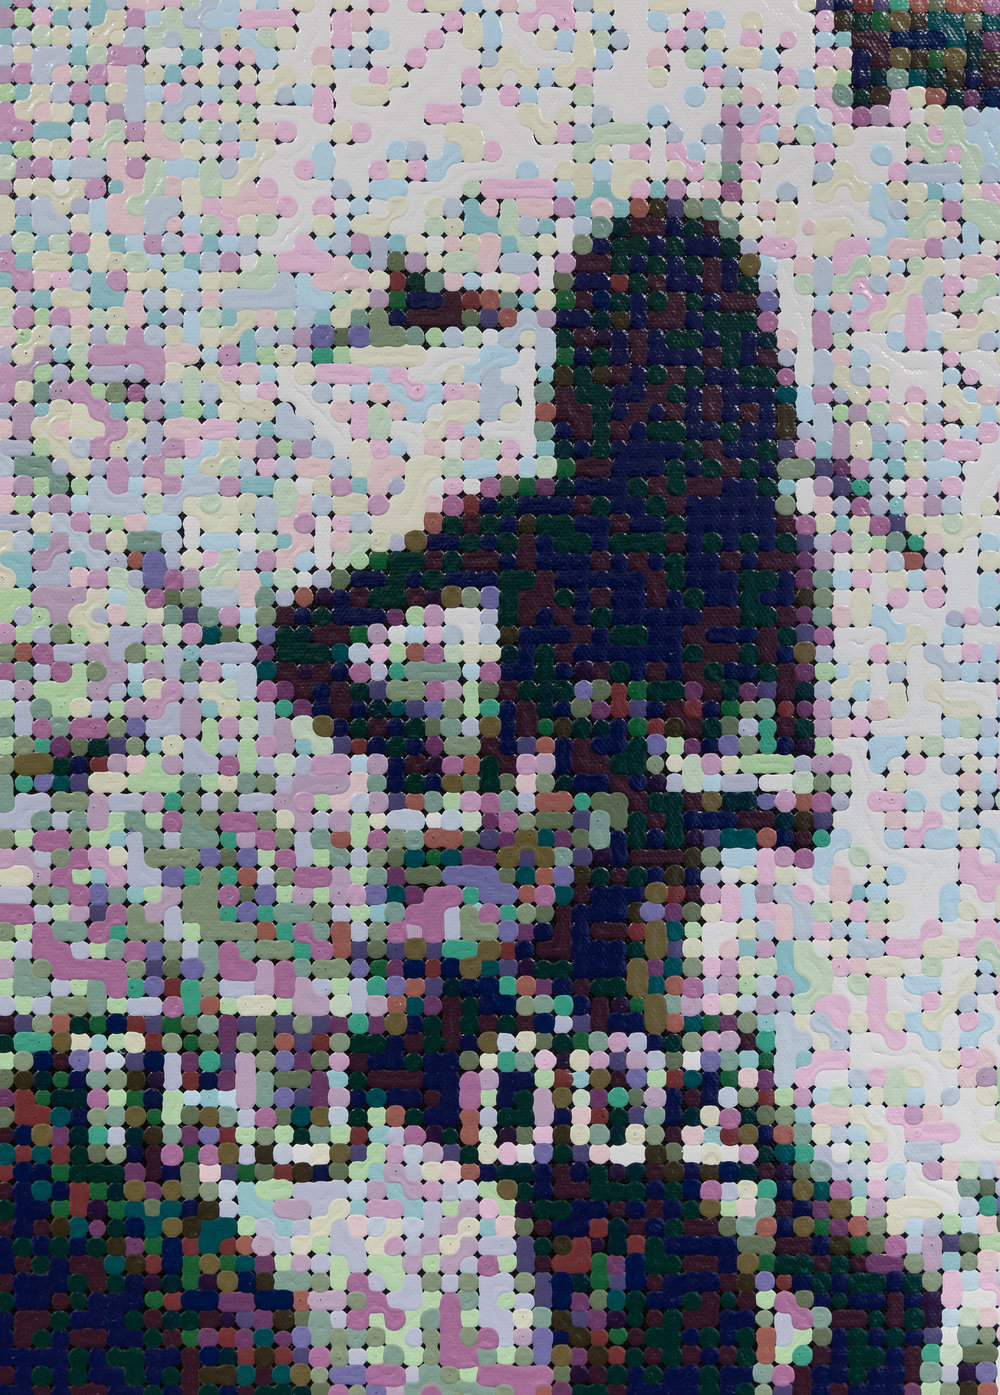 180618EFrossard_Trestle_Peers_4212Md.jpg